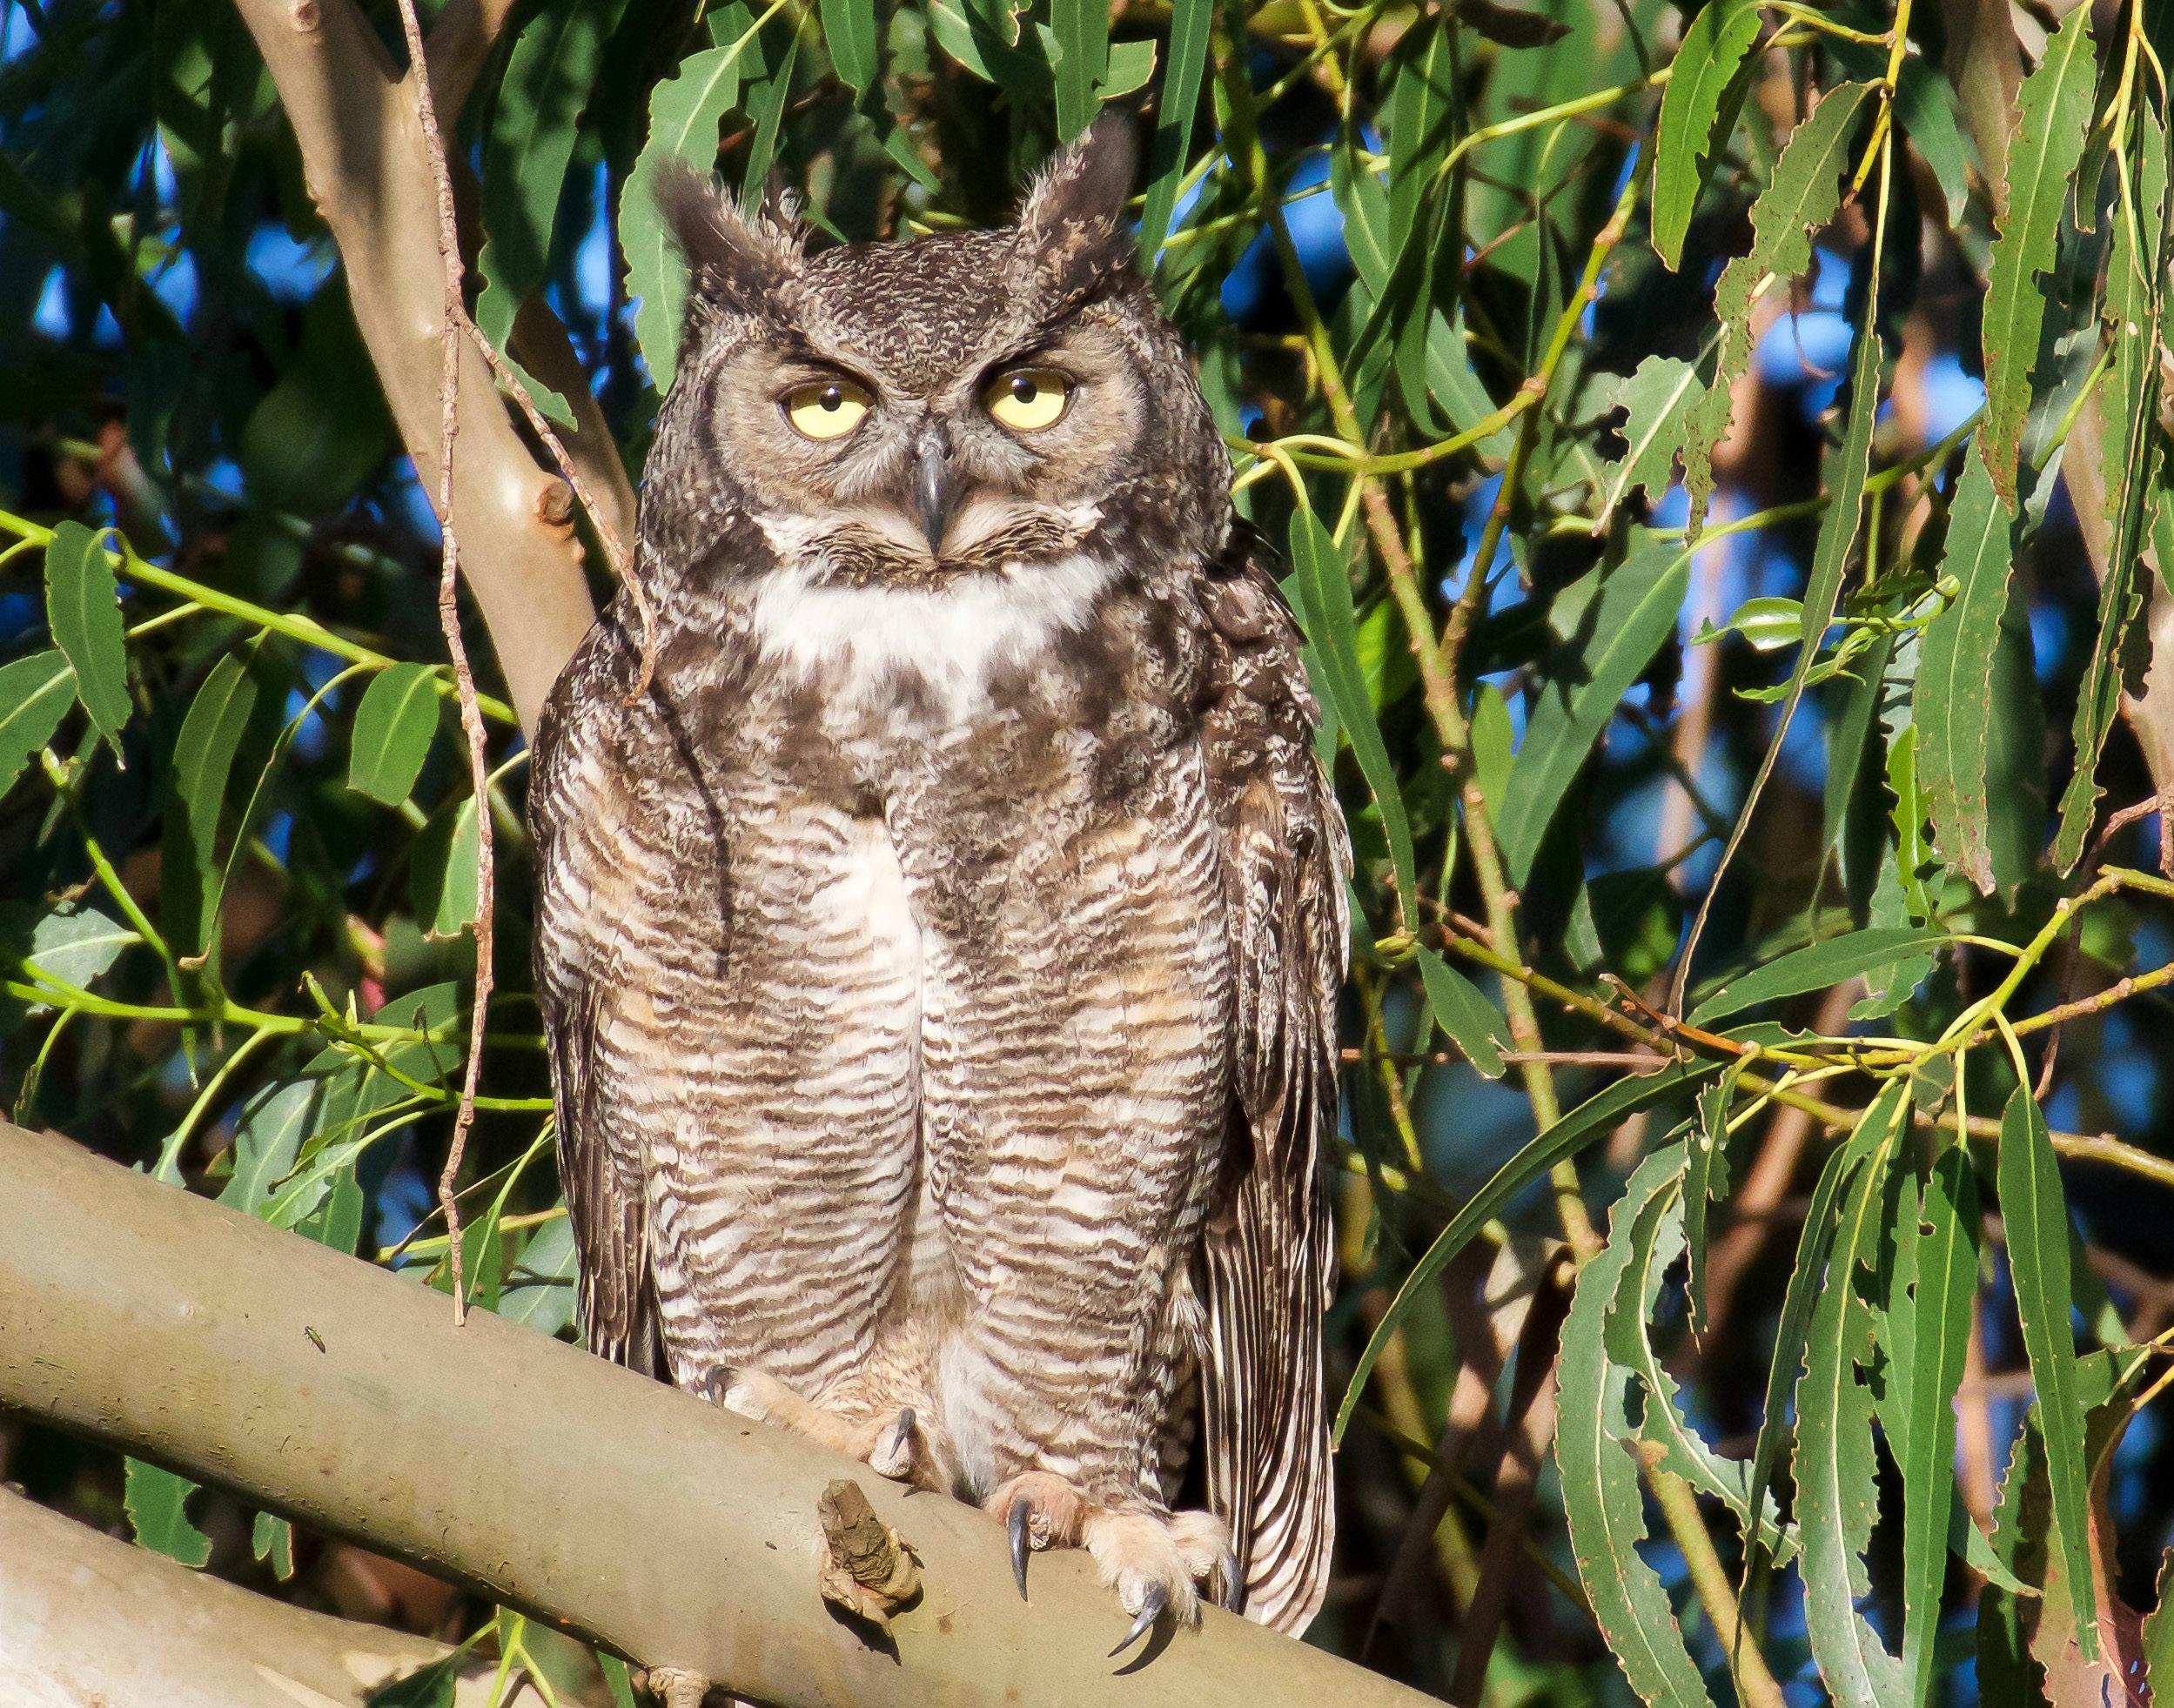 A great horned owl perched high in a eucalyptus tree in Petaluma, California.